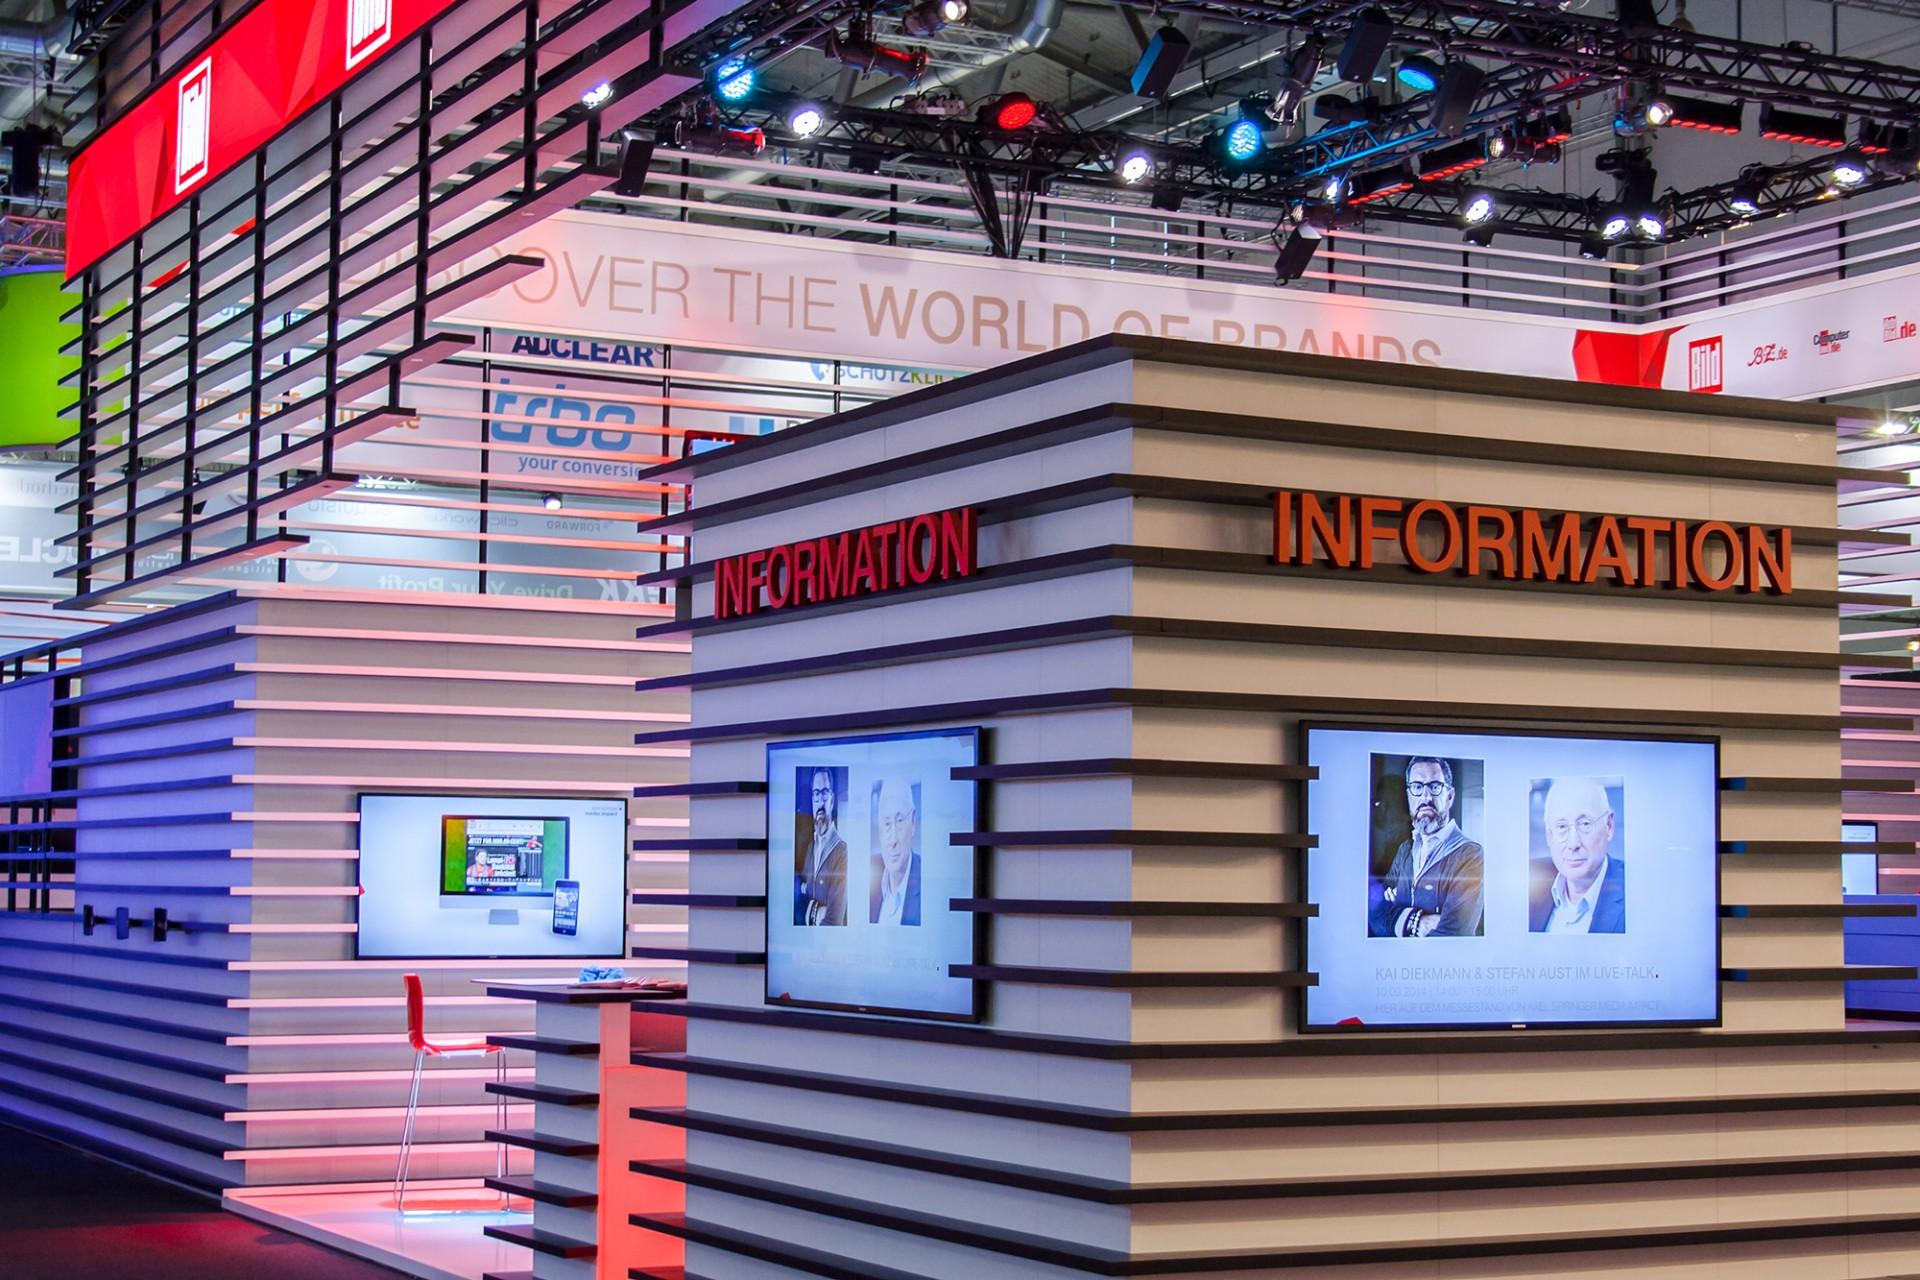 Axel Springer Media Impact | dmexco 2014